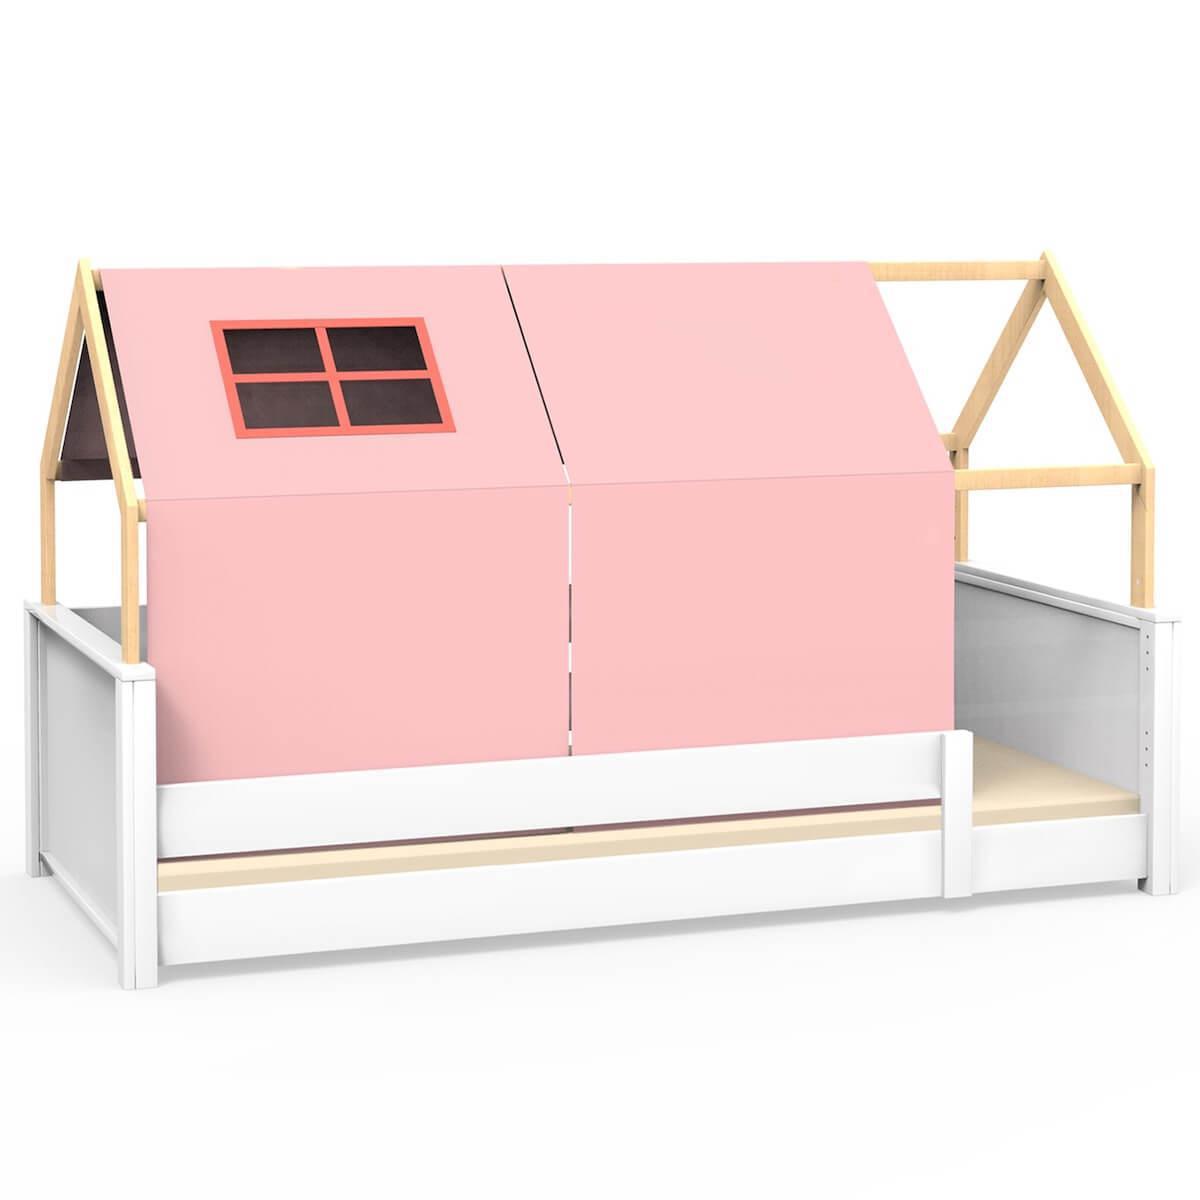 Cama montessori barrera simple-estructura techo KASVA con textileso Viena rosa